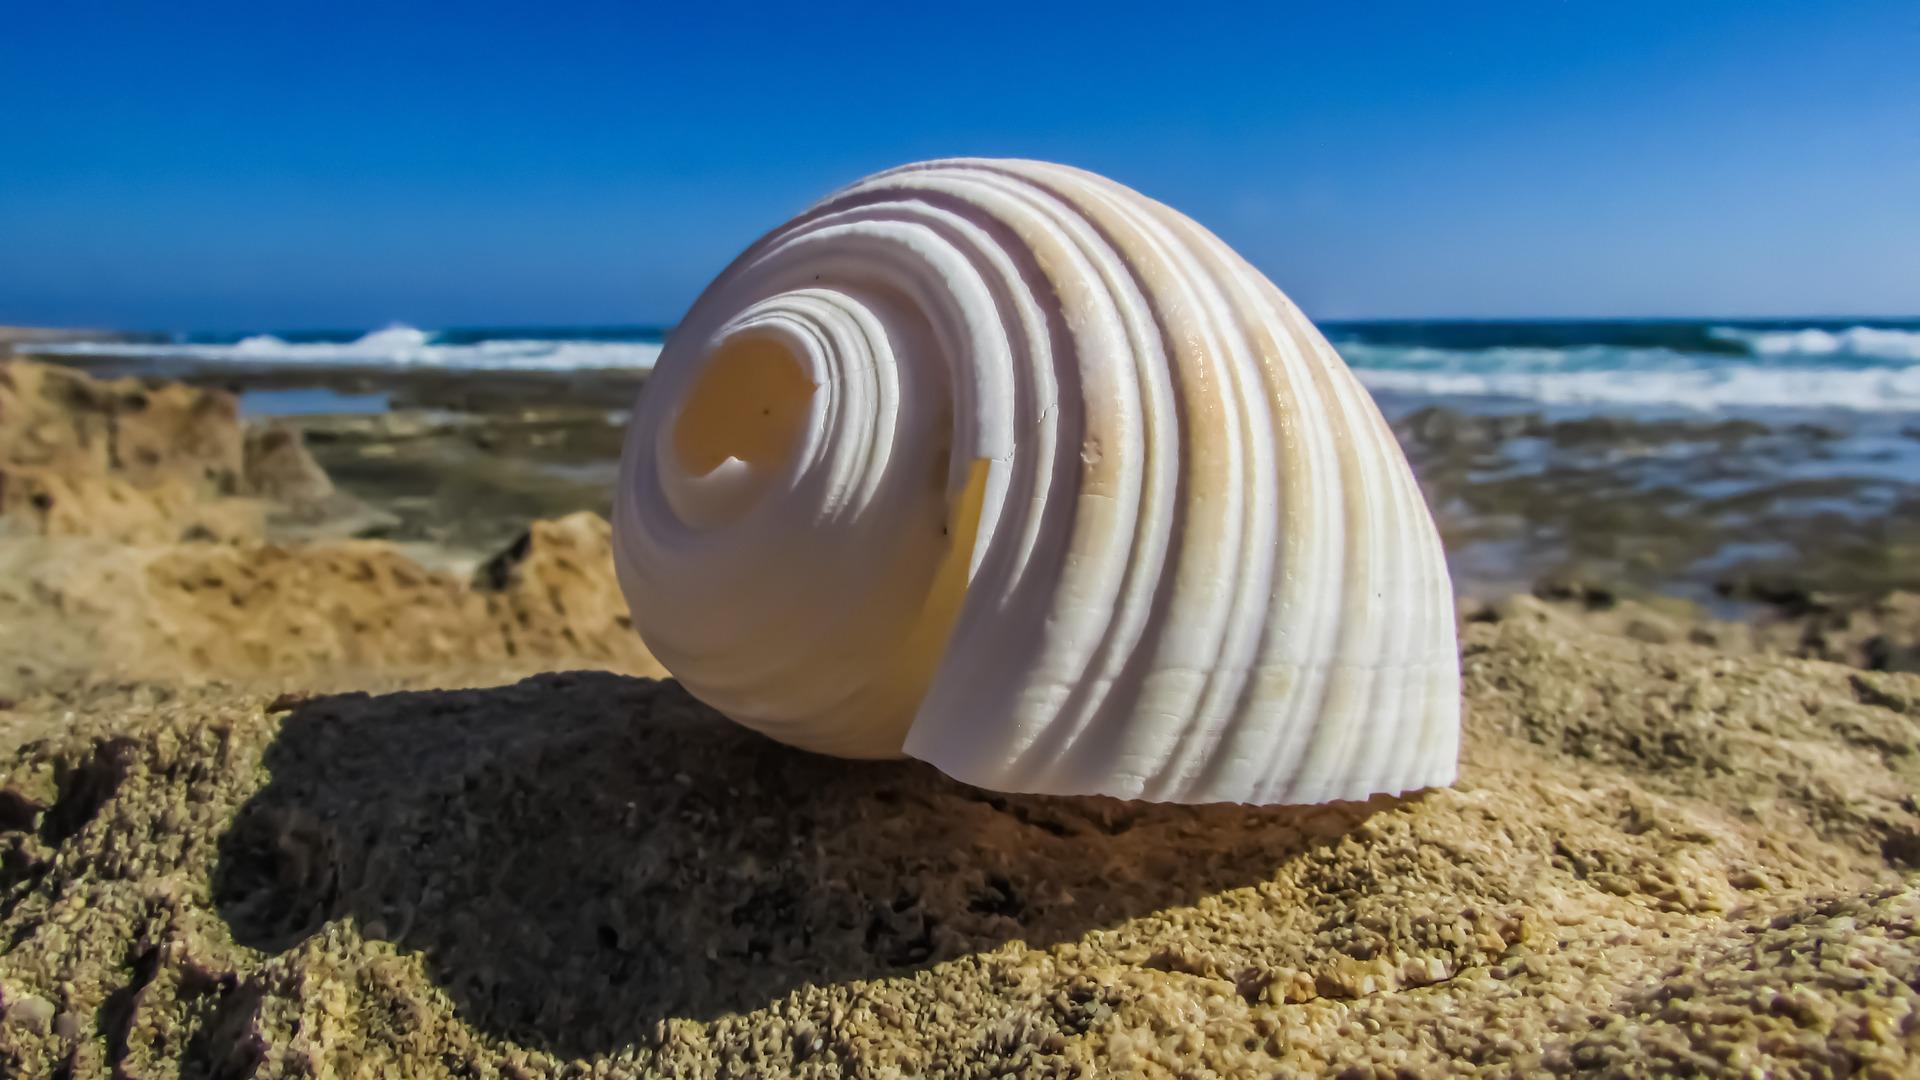 shell-1599127_1920